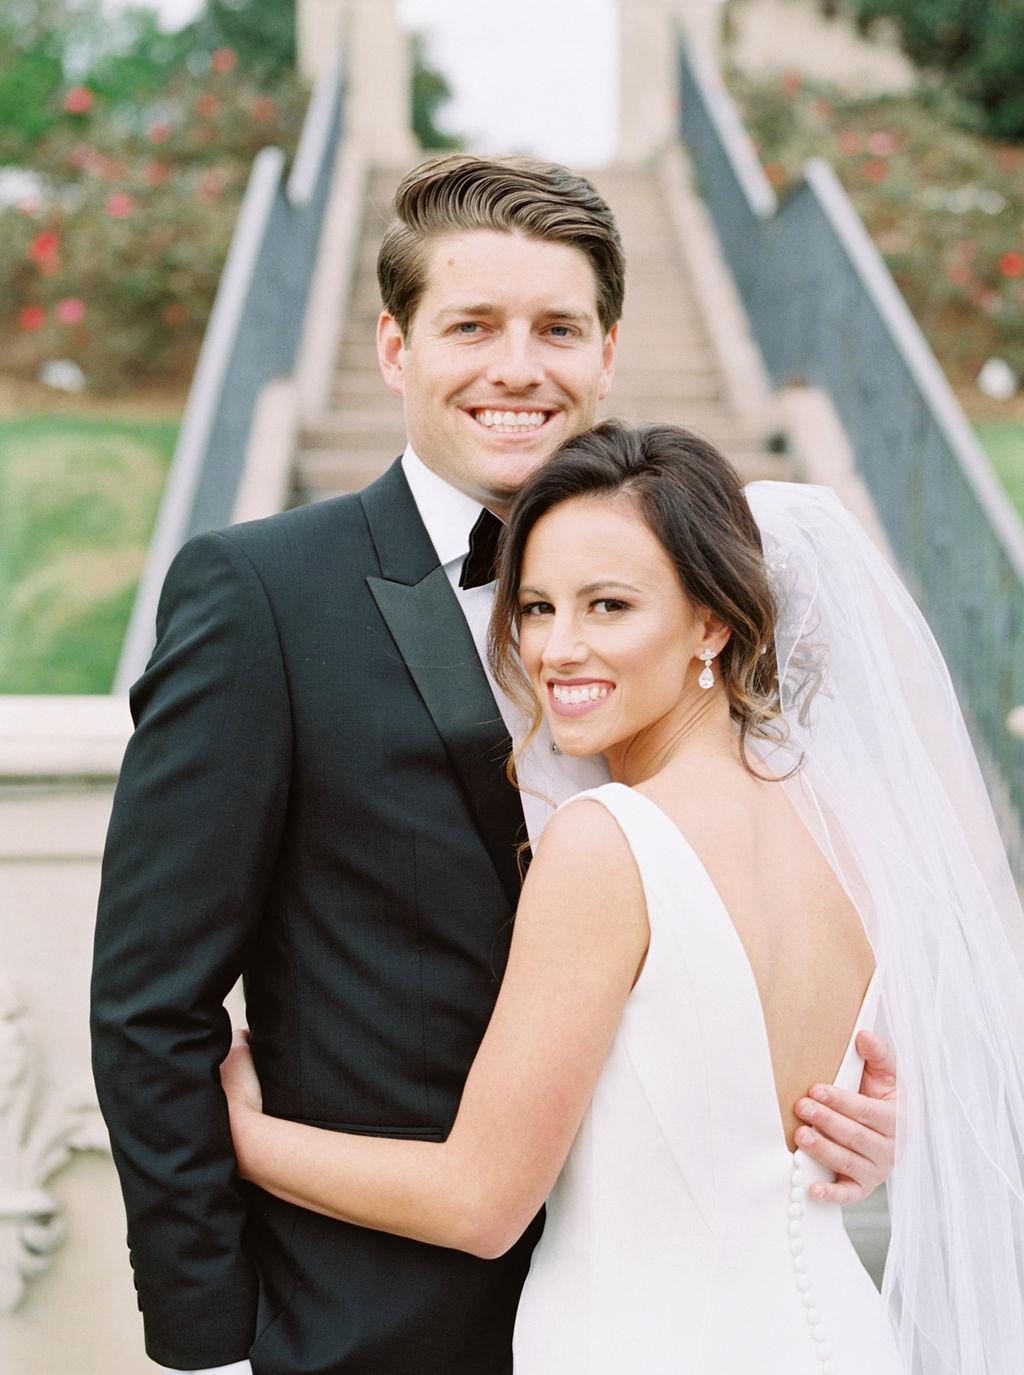 Austin-Film-Wedding-Photographer-Royal-Oaks-Country-Club-41.jpg